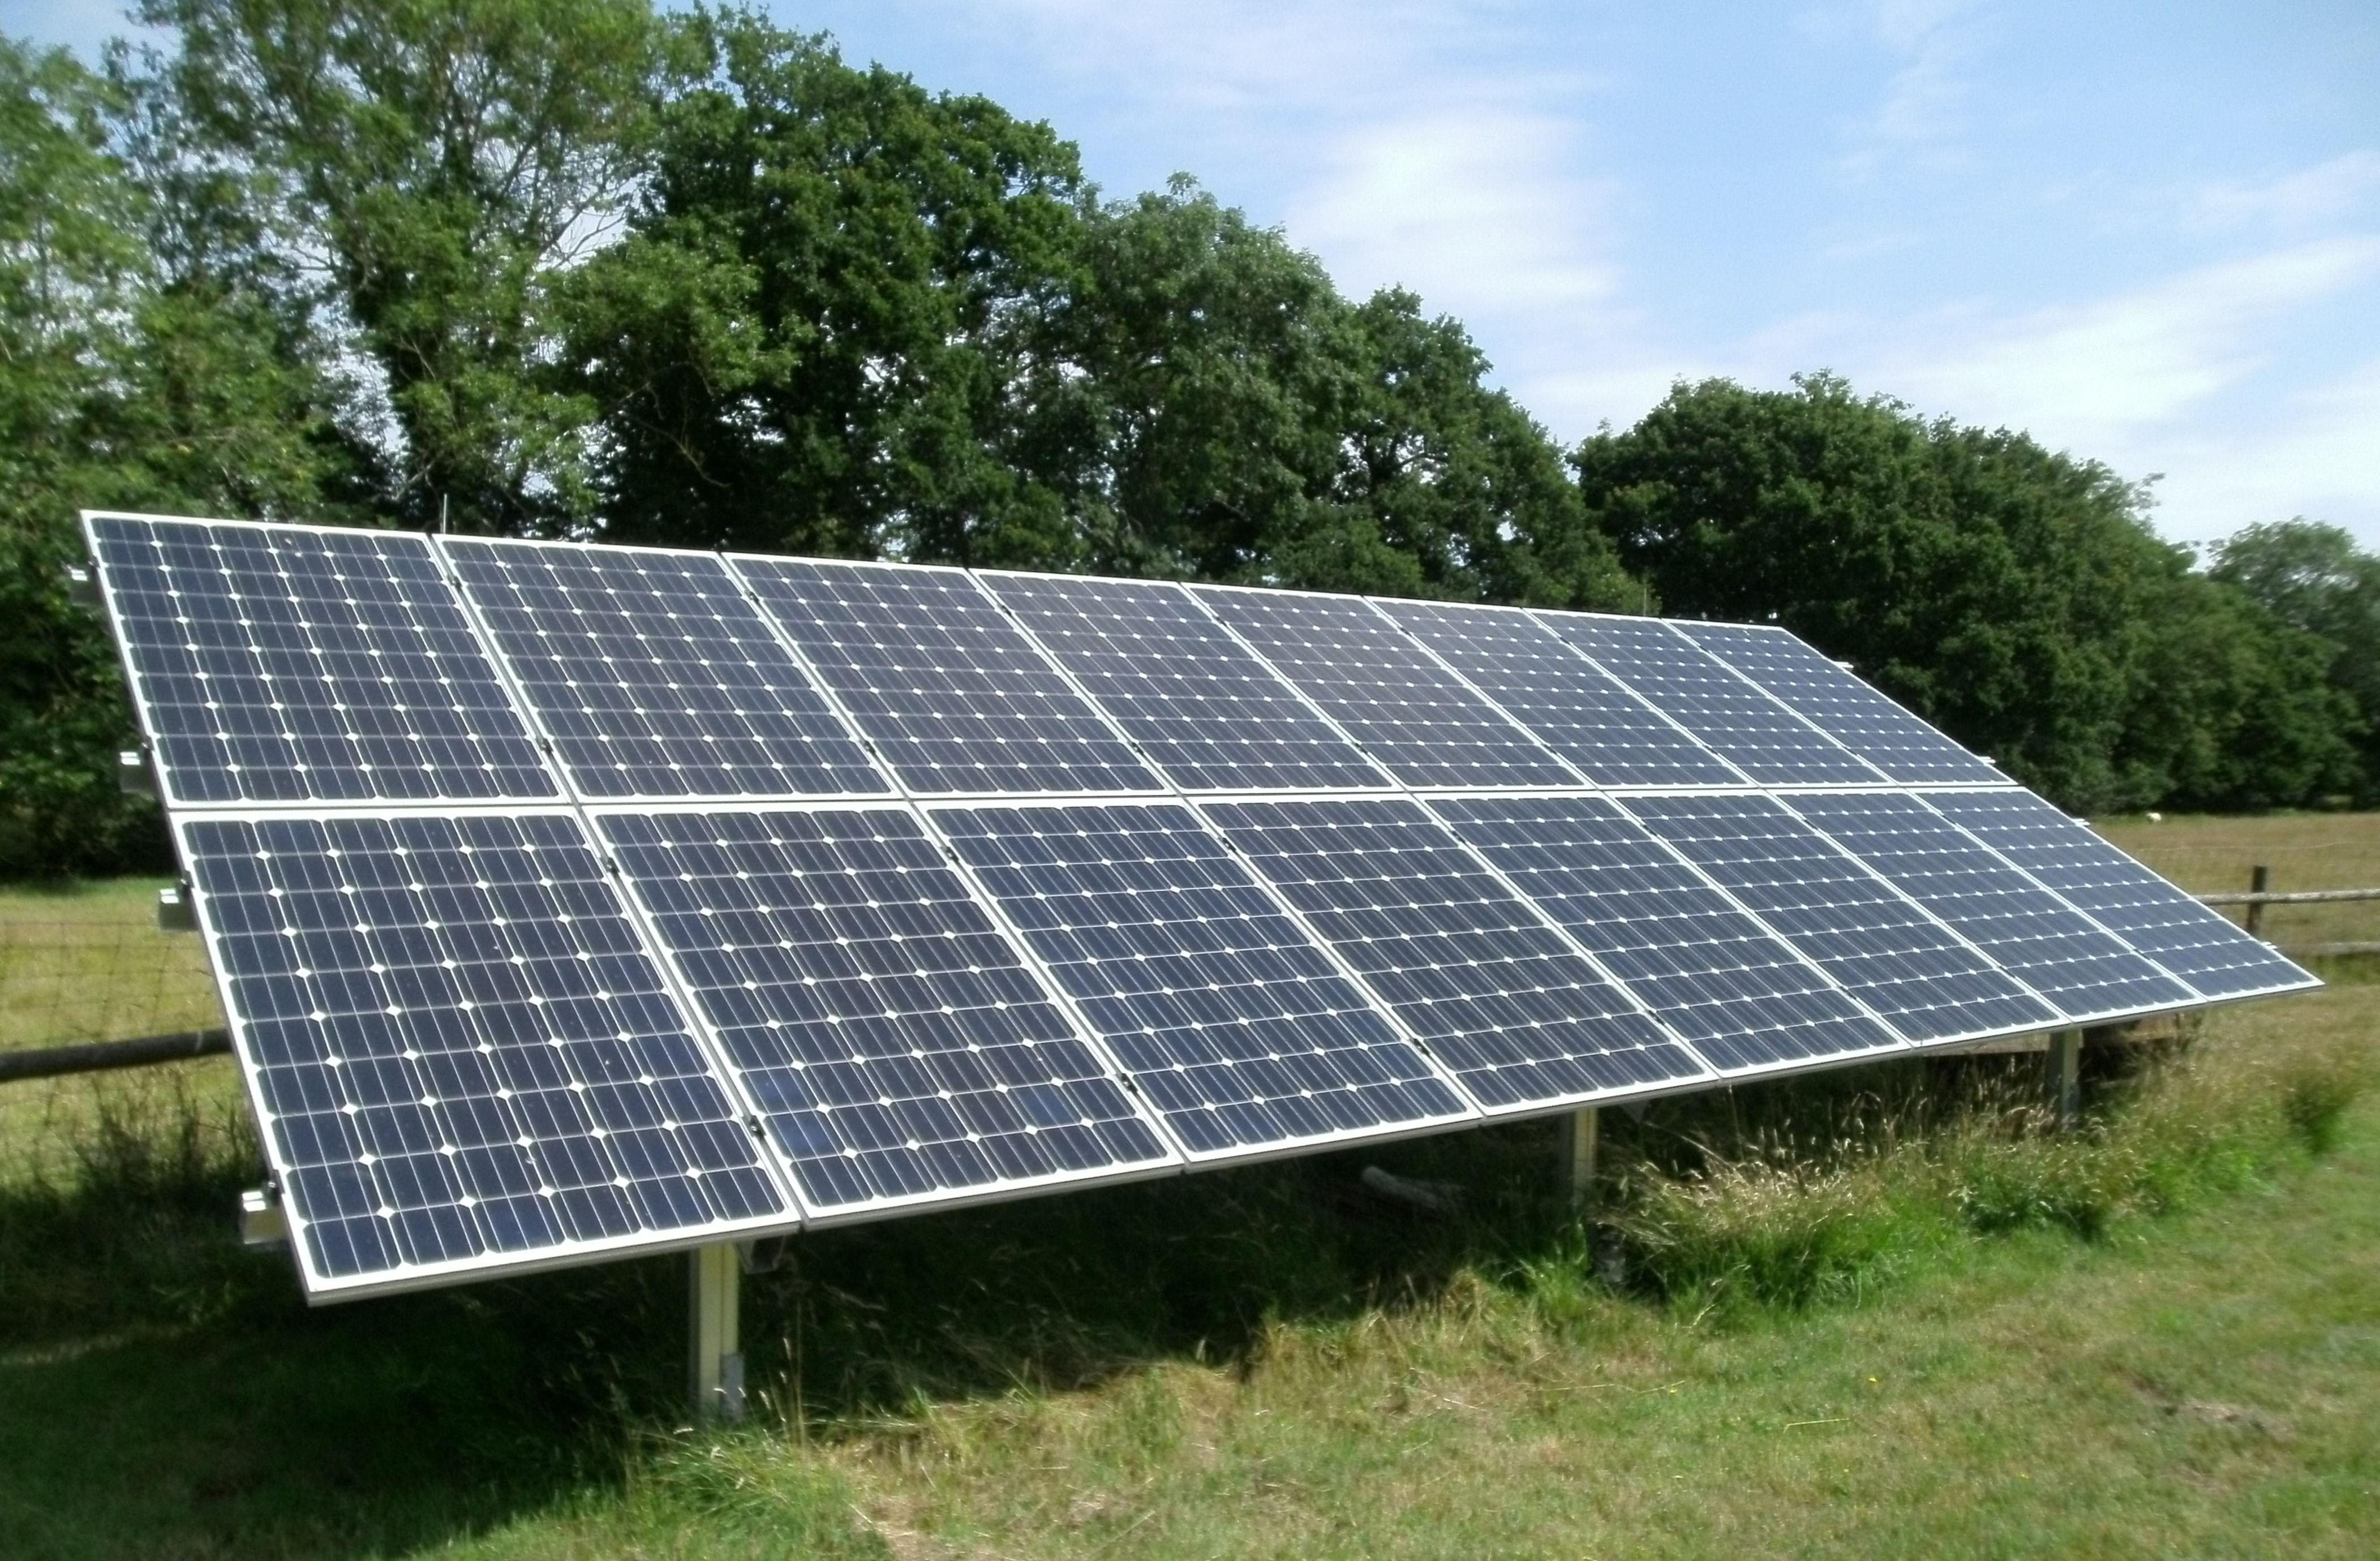 Ashford 2012 Solarage Solar Panel And Heat Pump